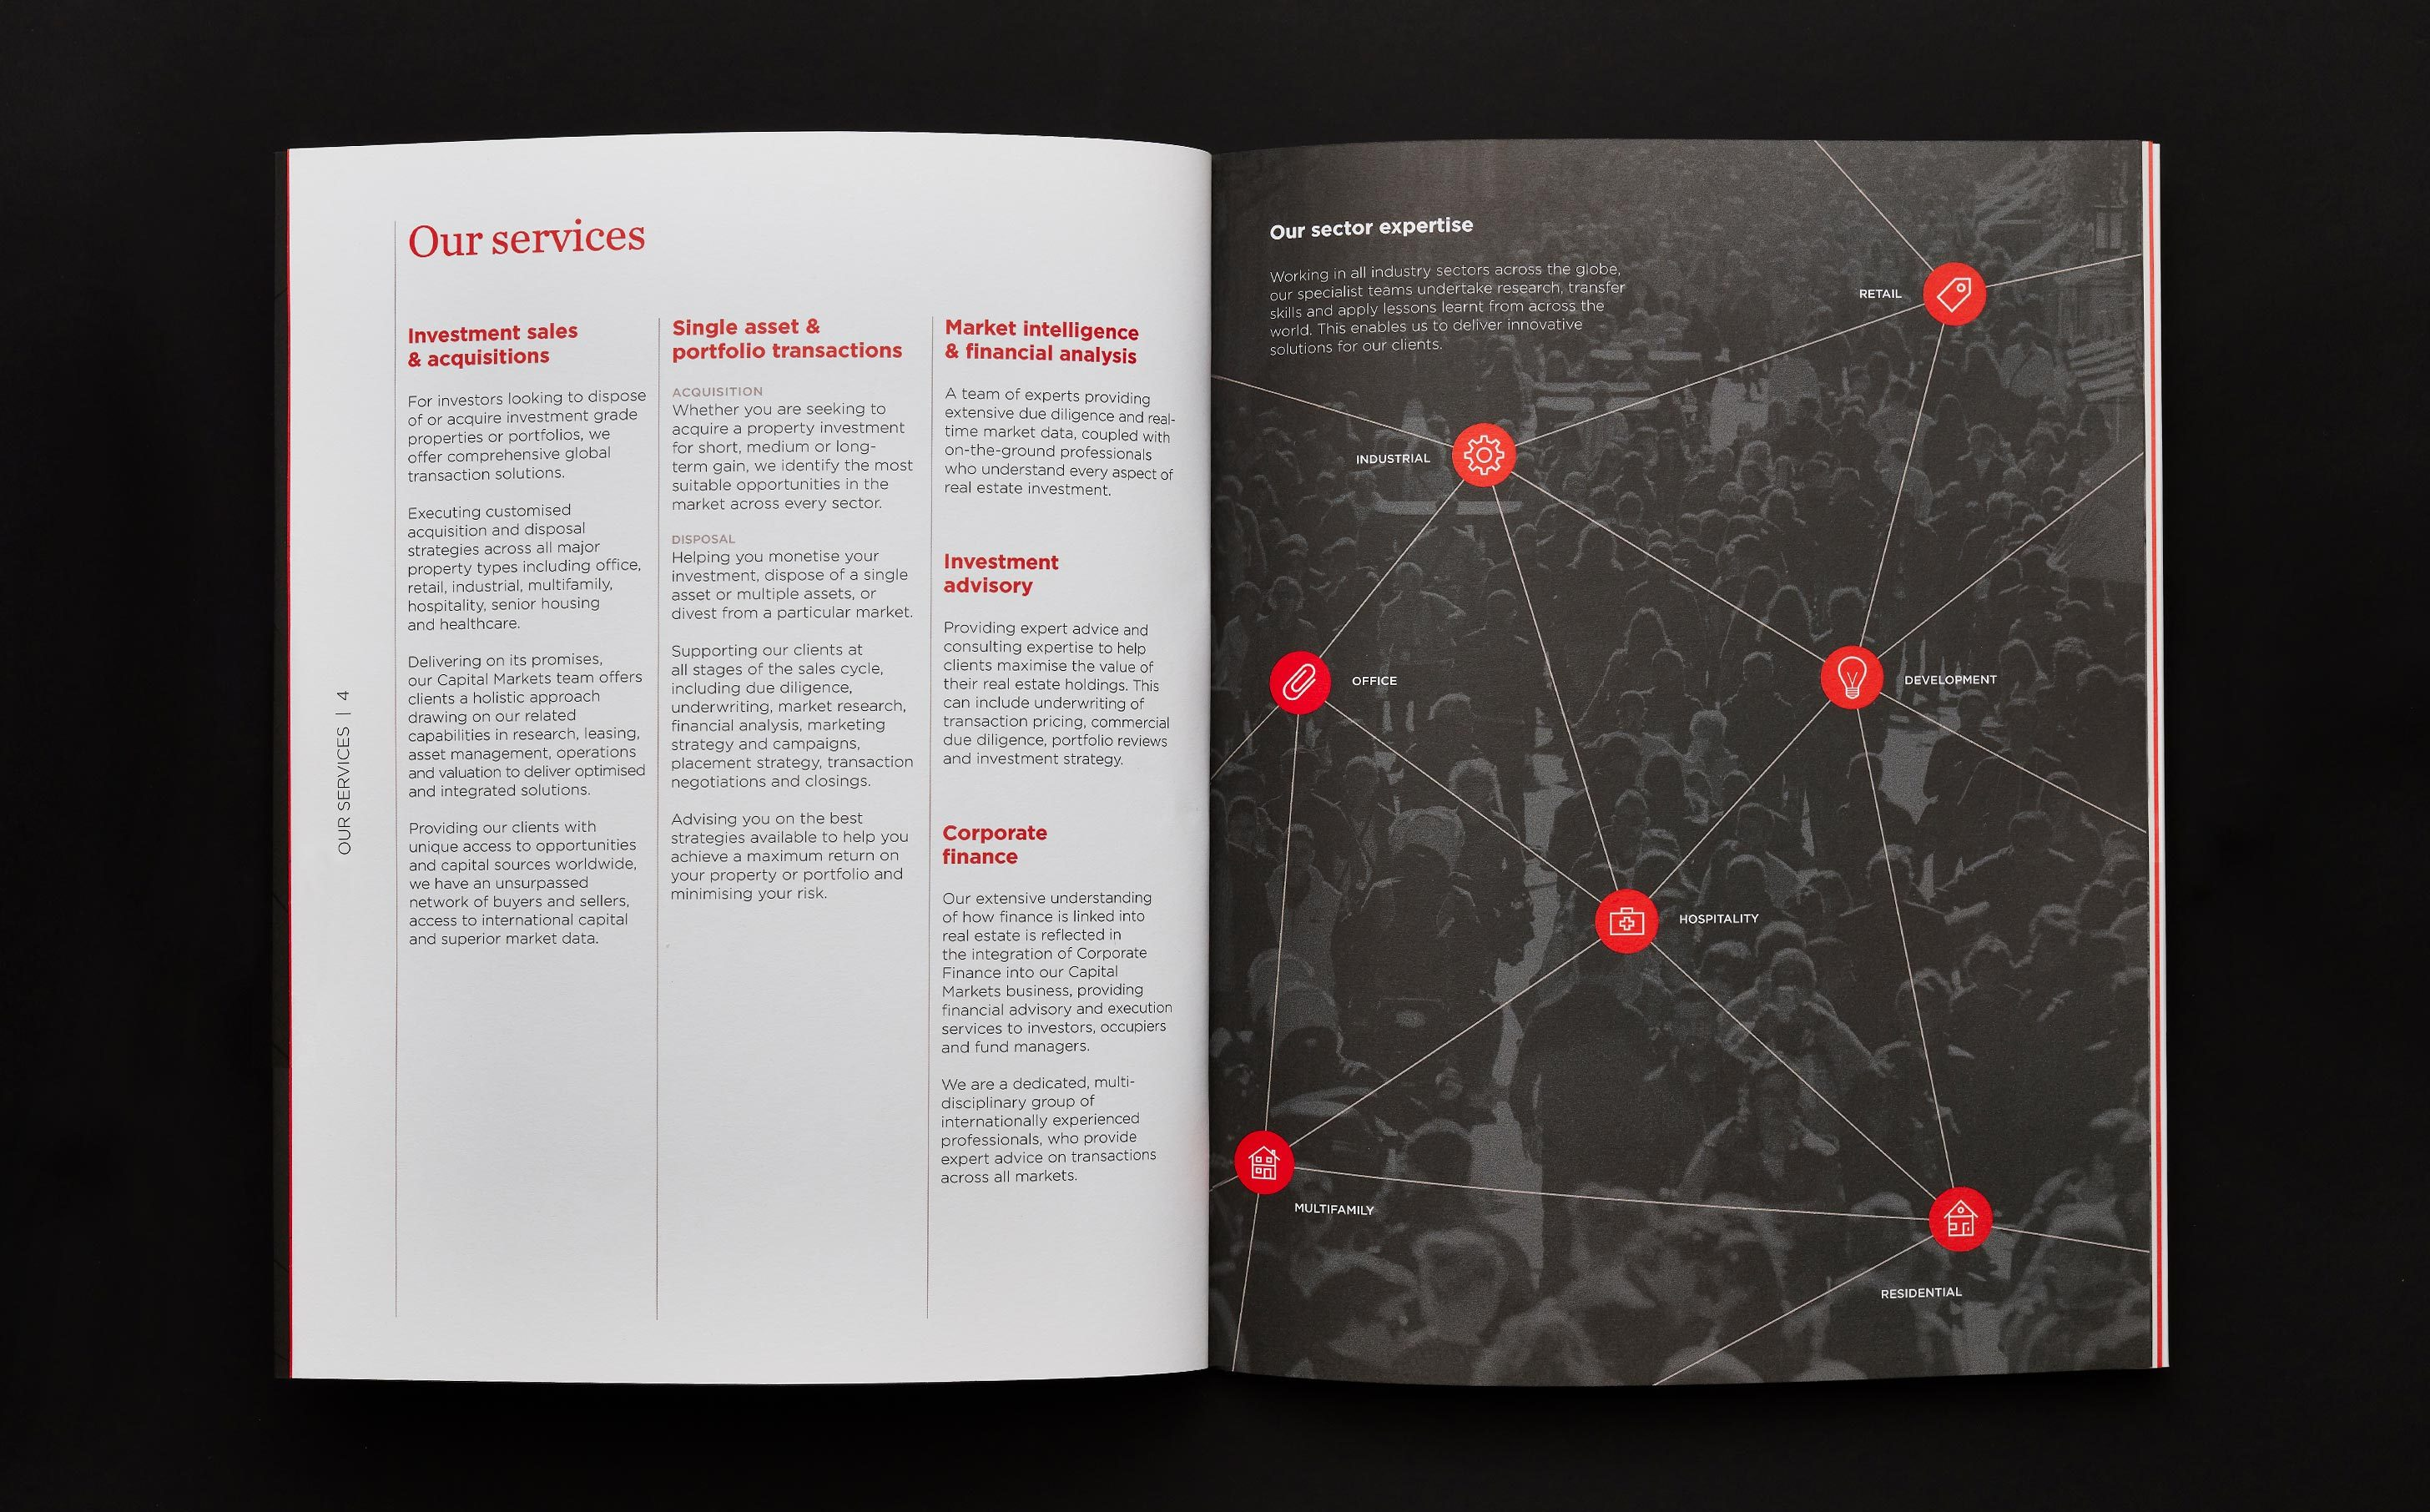 Cushman-wakefiled-EMEA-brochure-2